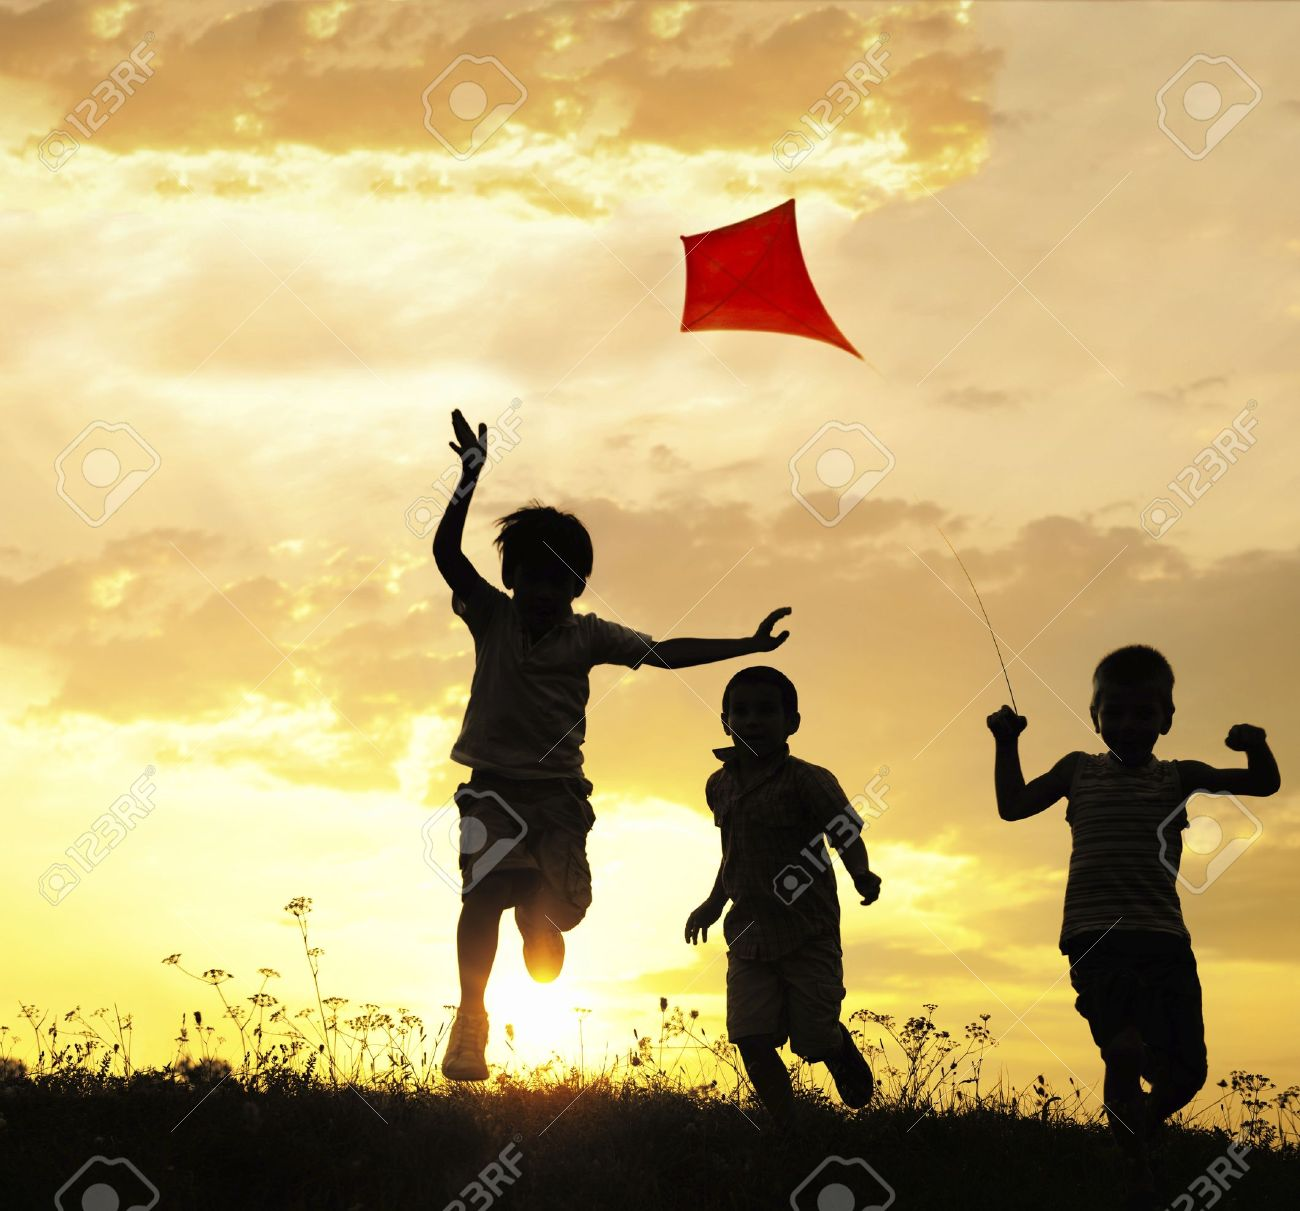 Children running with kite - 14054787